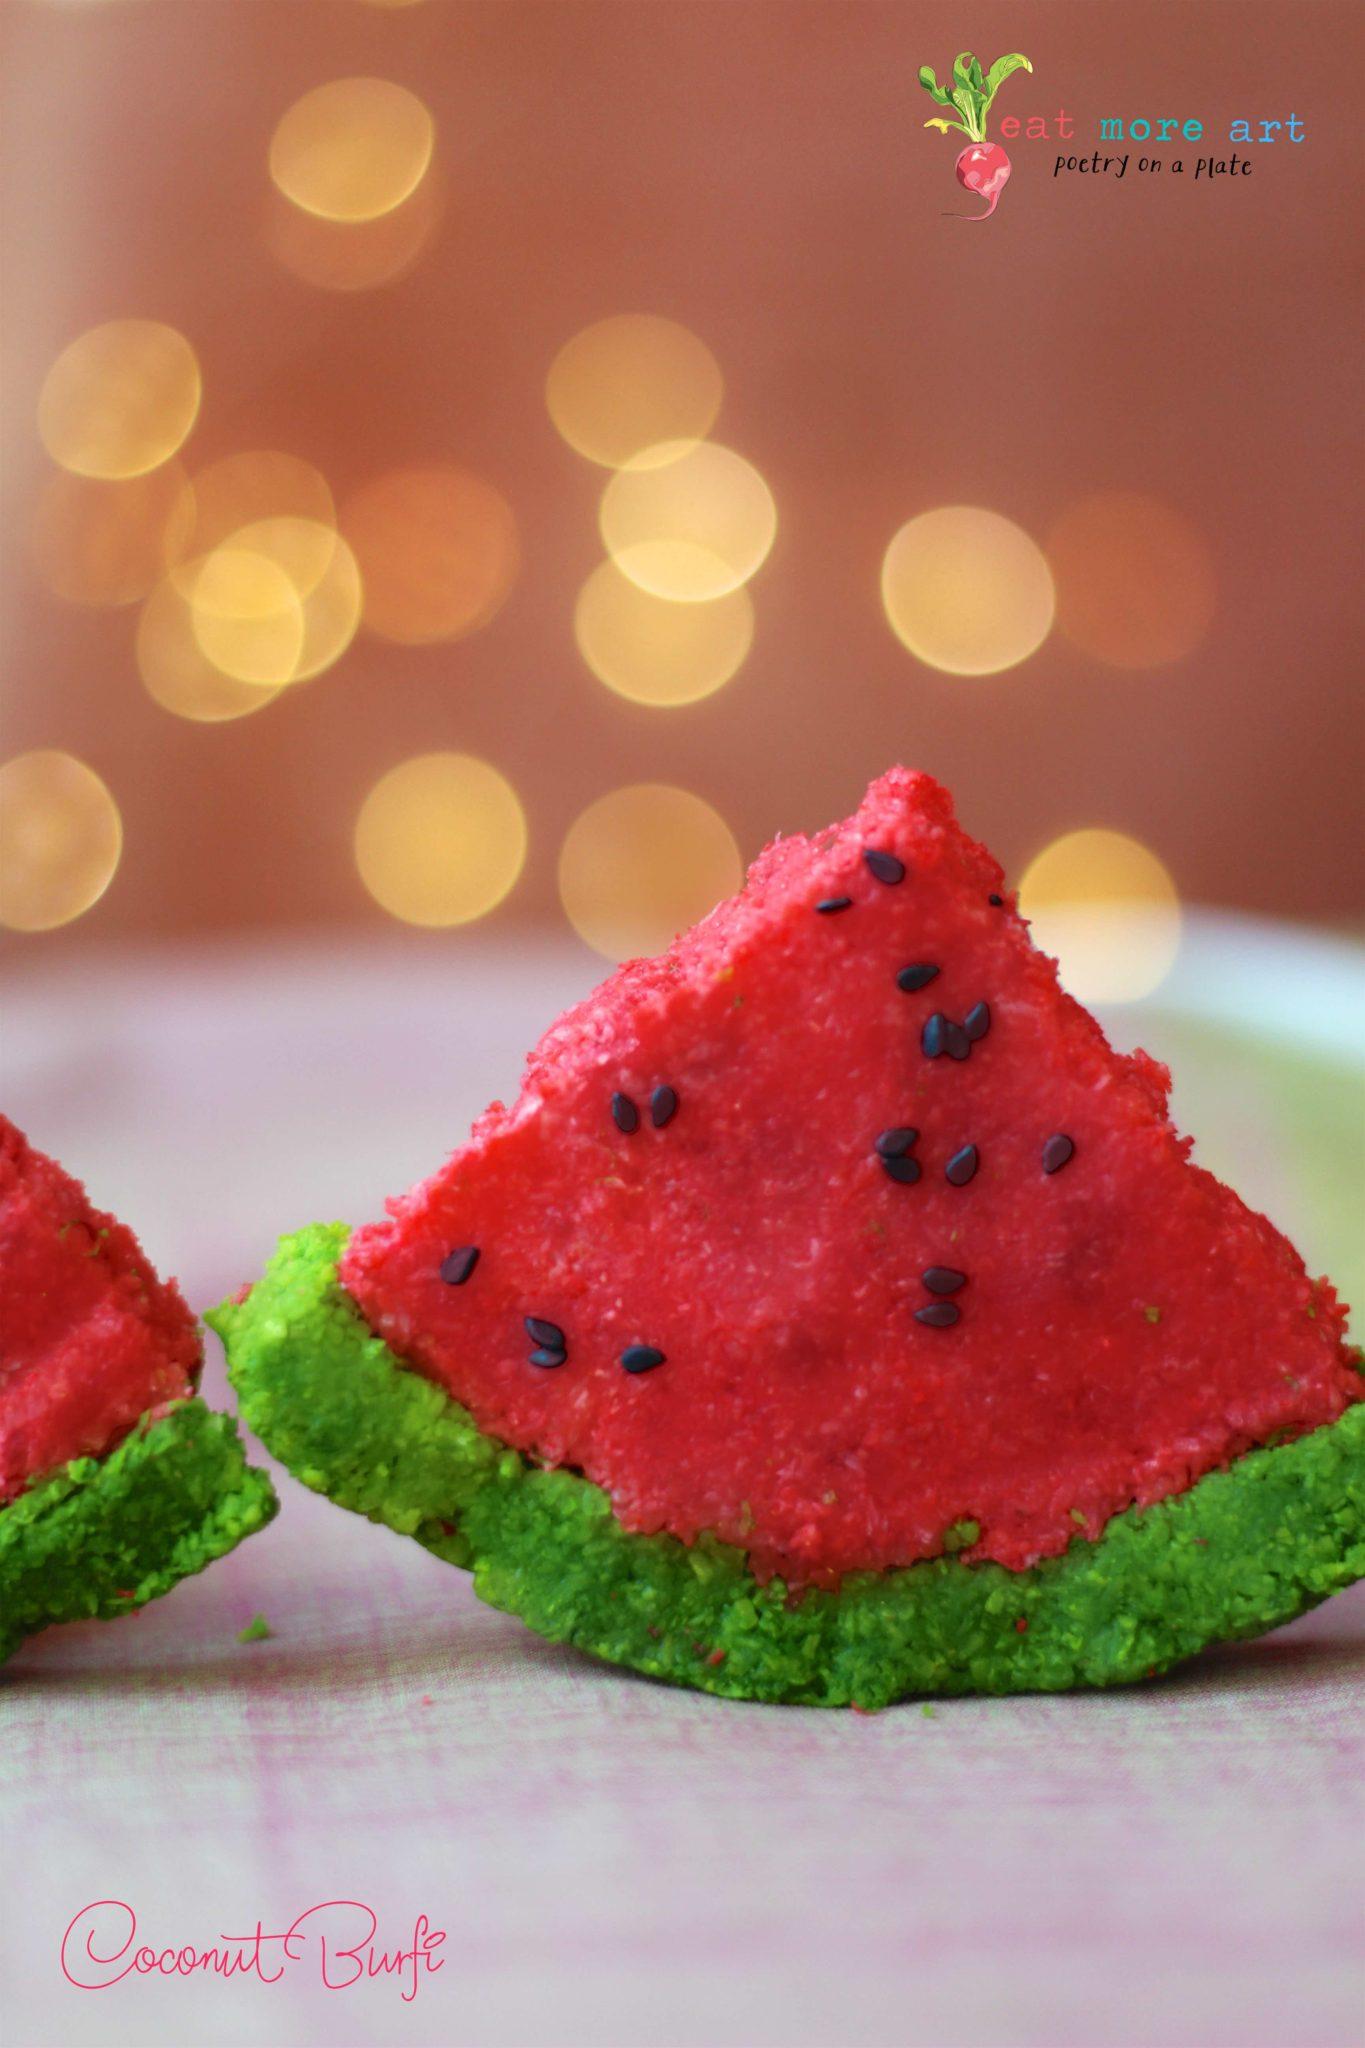 Coconut Burfi dressed like Watermelon | Coconut Fudge | Eat More Art